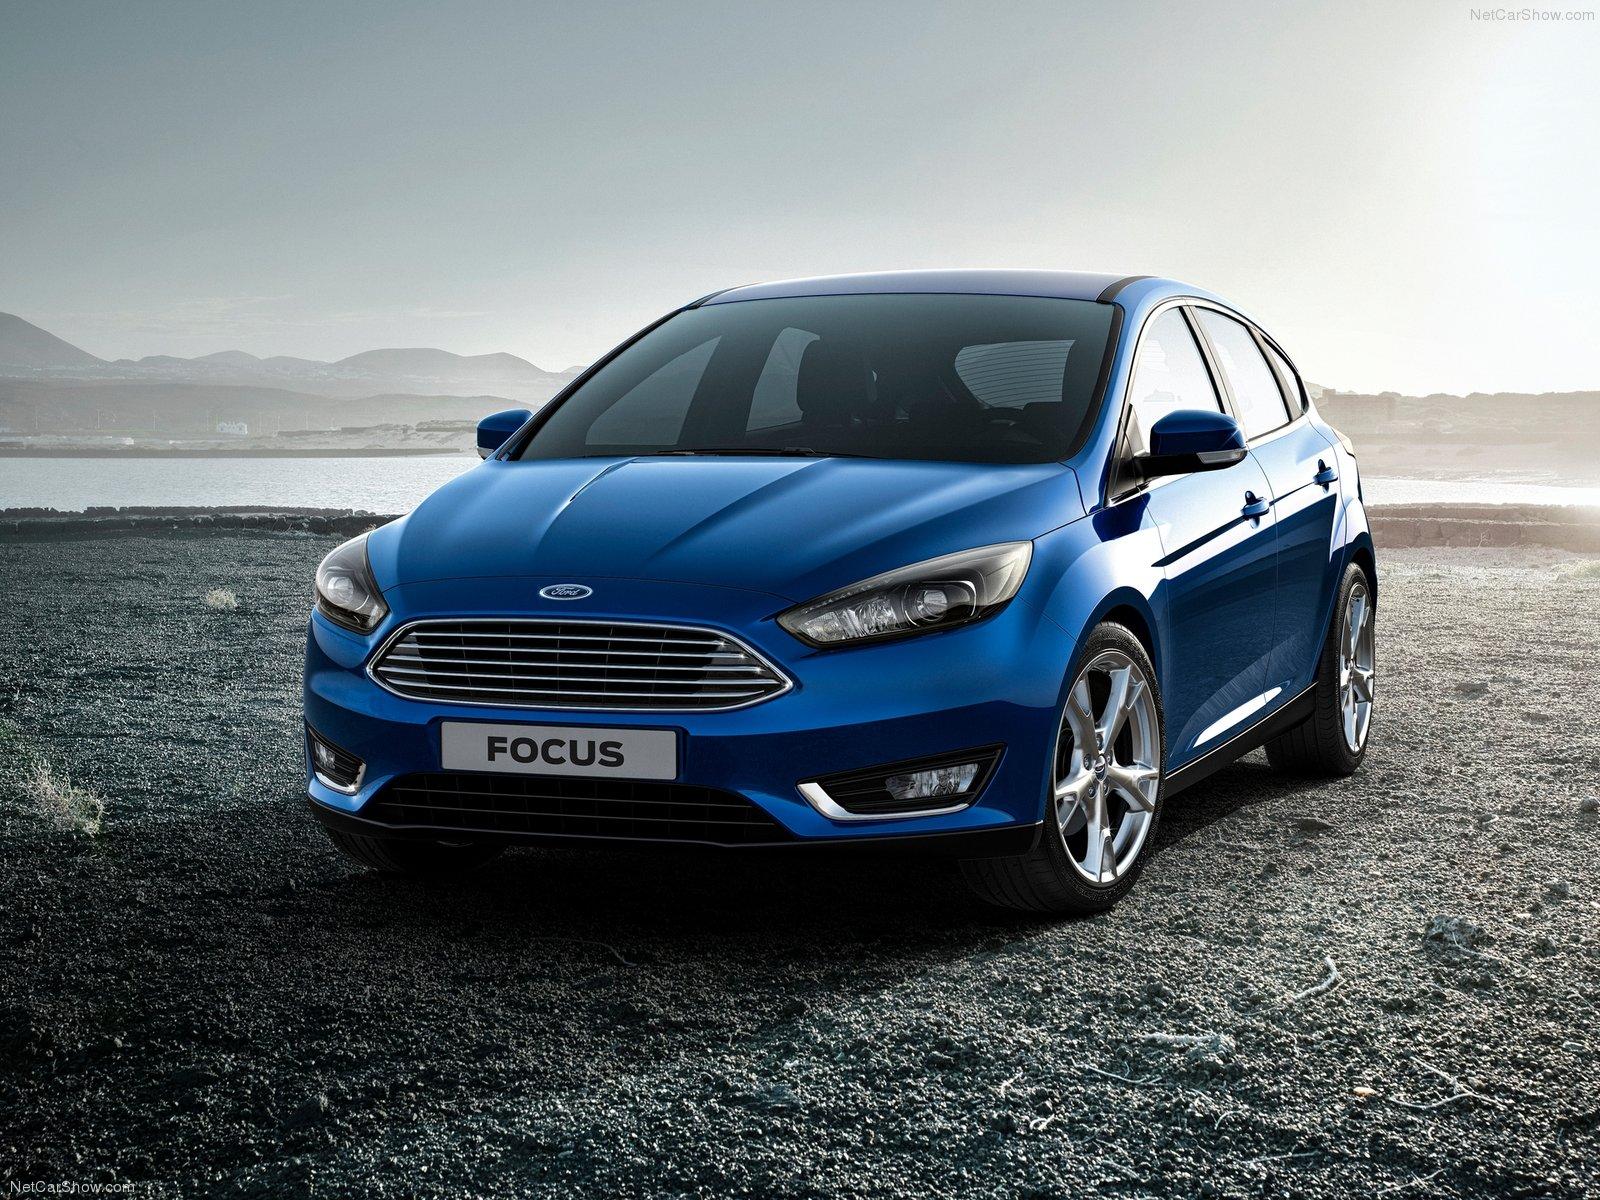 Хэтчбек Ford Focus 3 (2016-2017) цена и характеристики ...